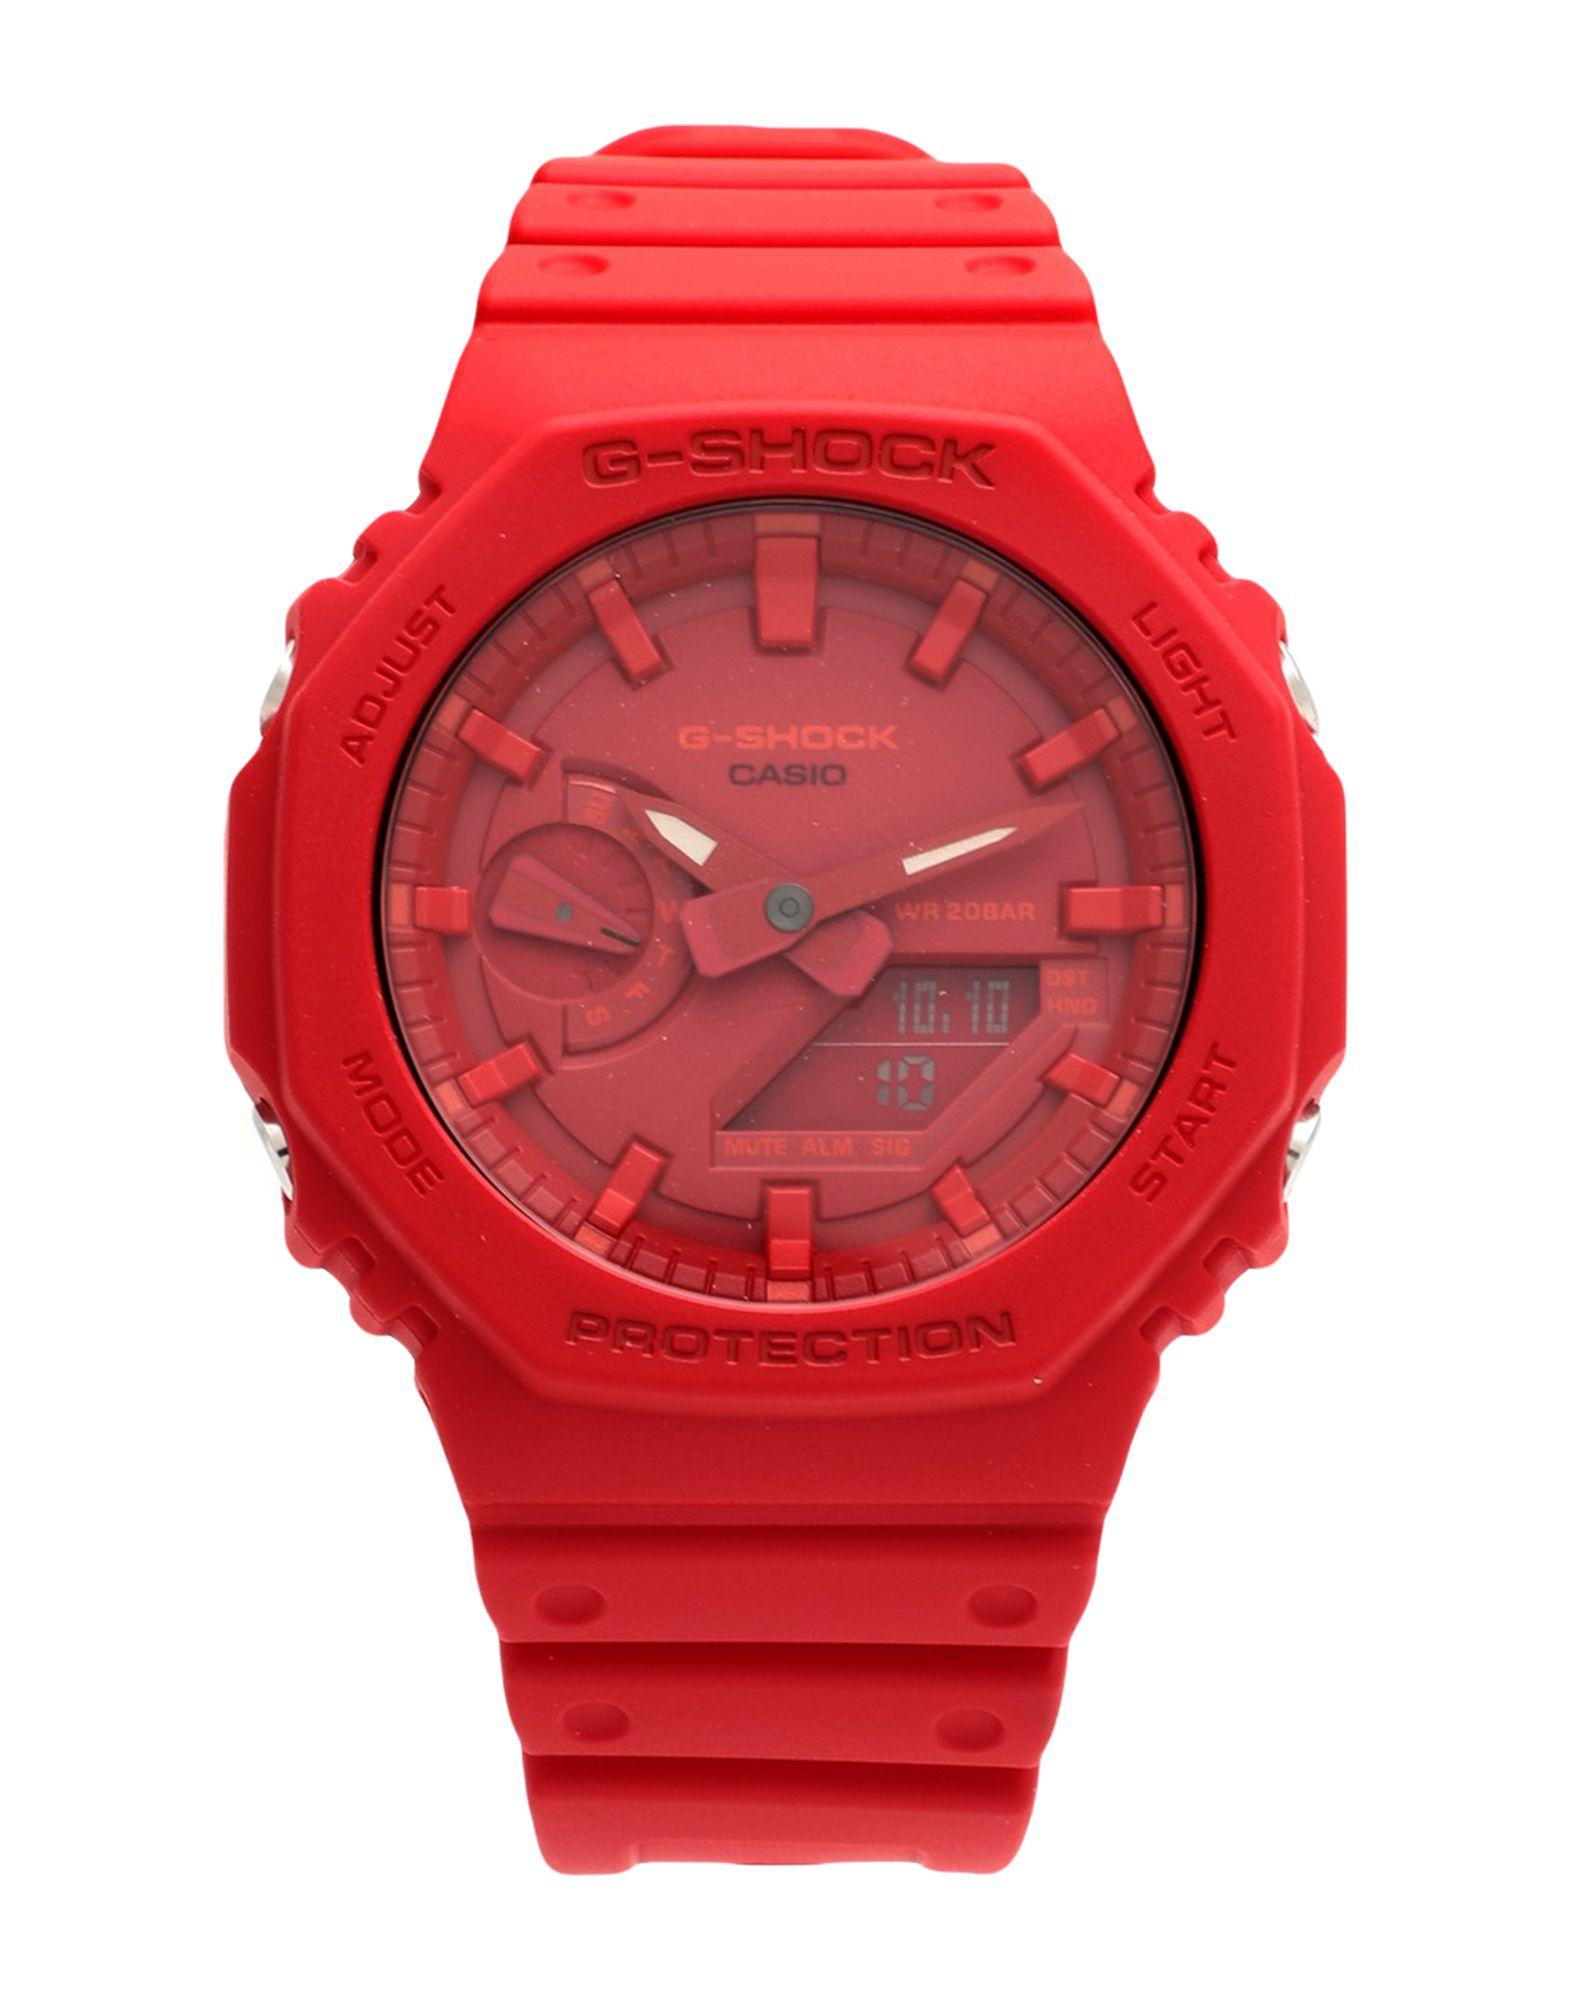 CASIO G-SHOCK Наручные часы наручные часы casio g shock gd x6900rd 4e